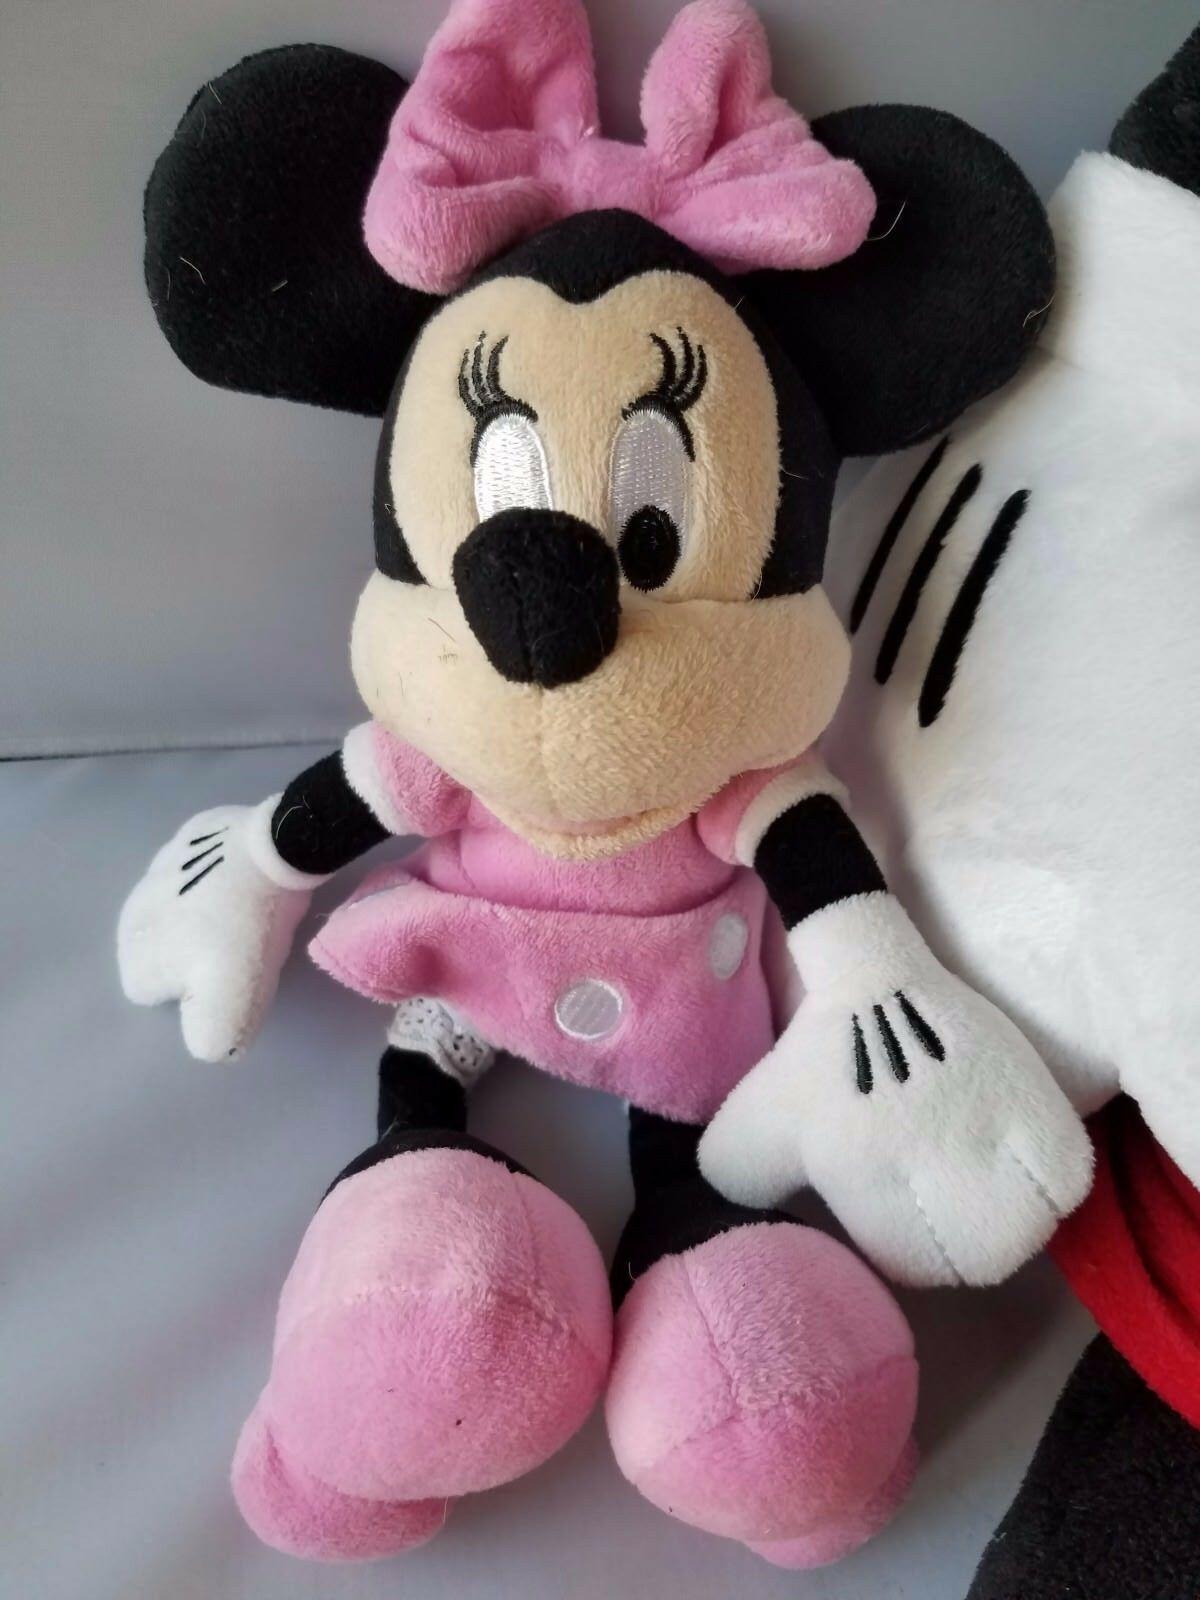 Disney Large Mickey Mouse Plush Toy Stuffed Animal +FREE Minnie Mouse Pink Dress